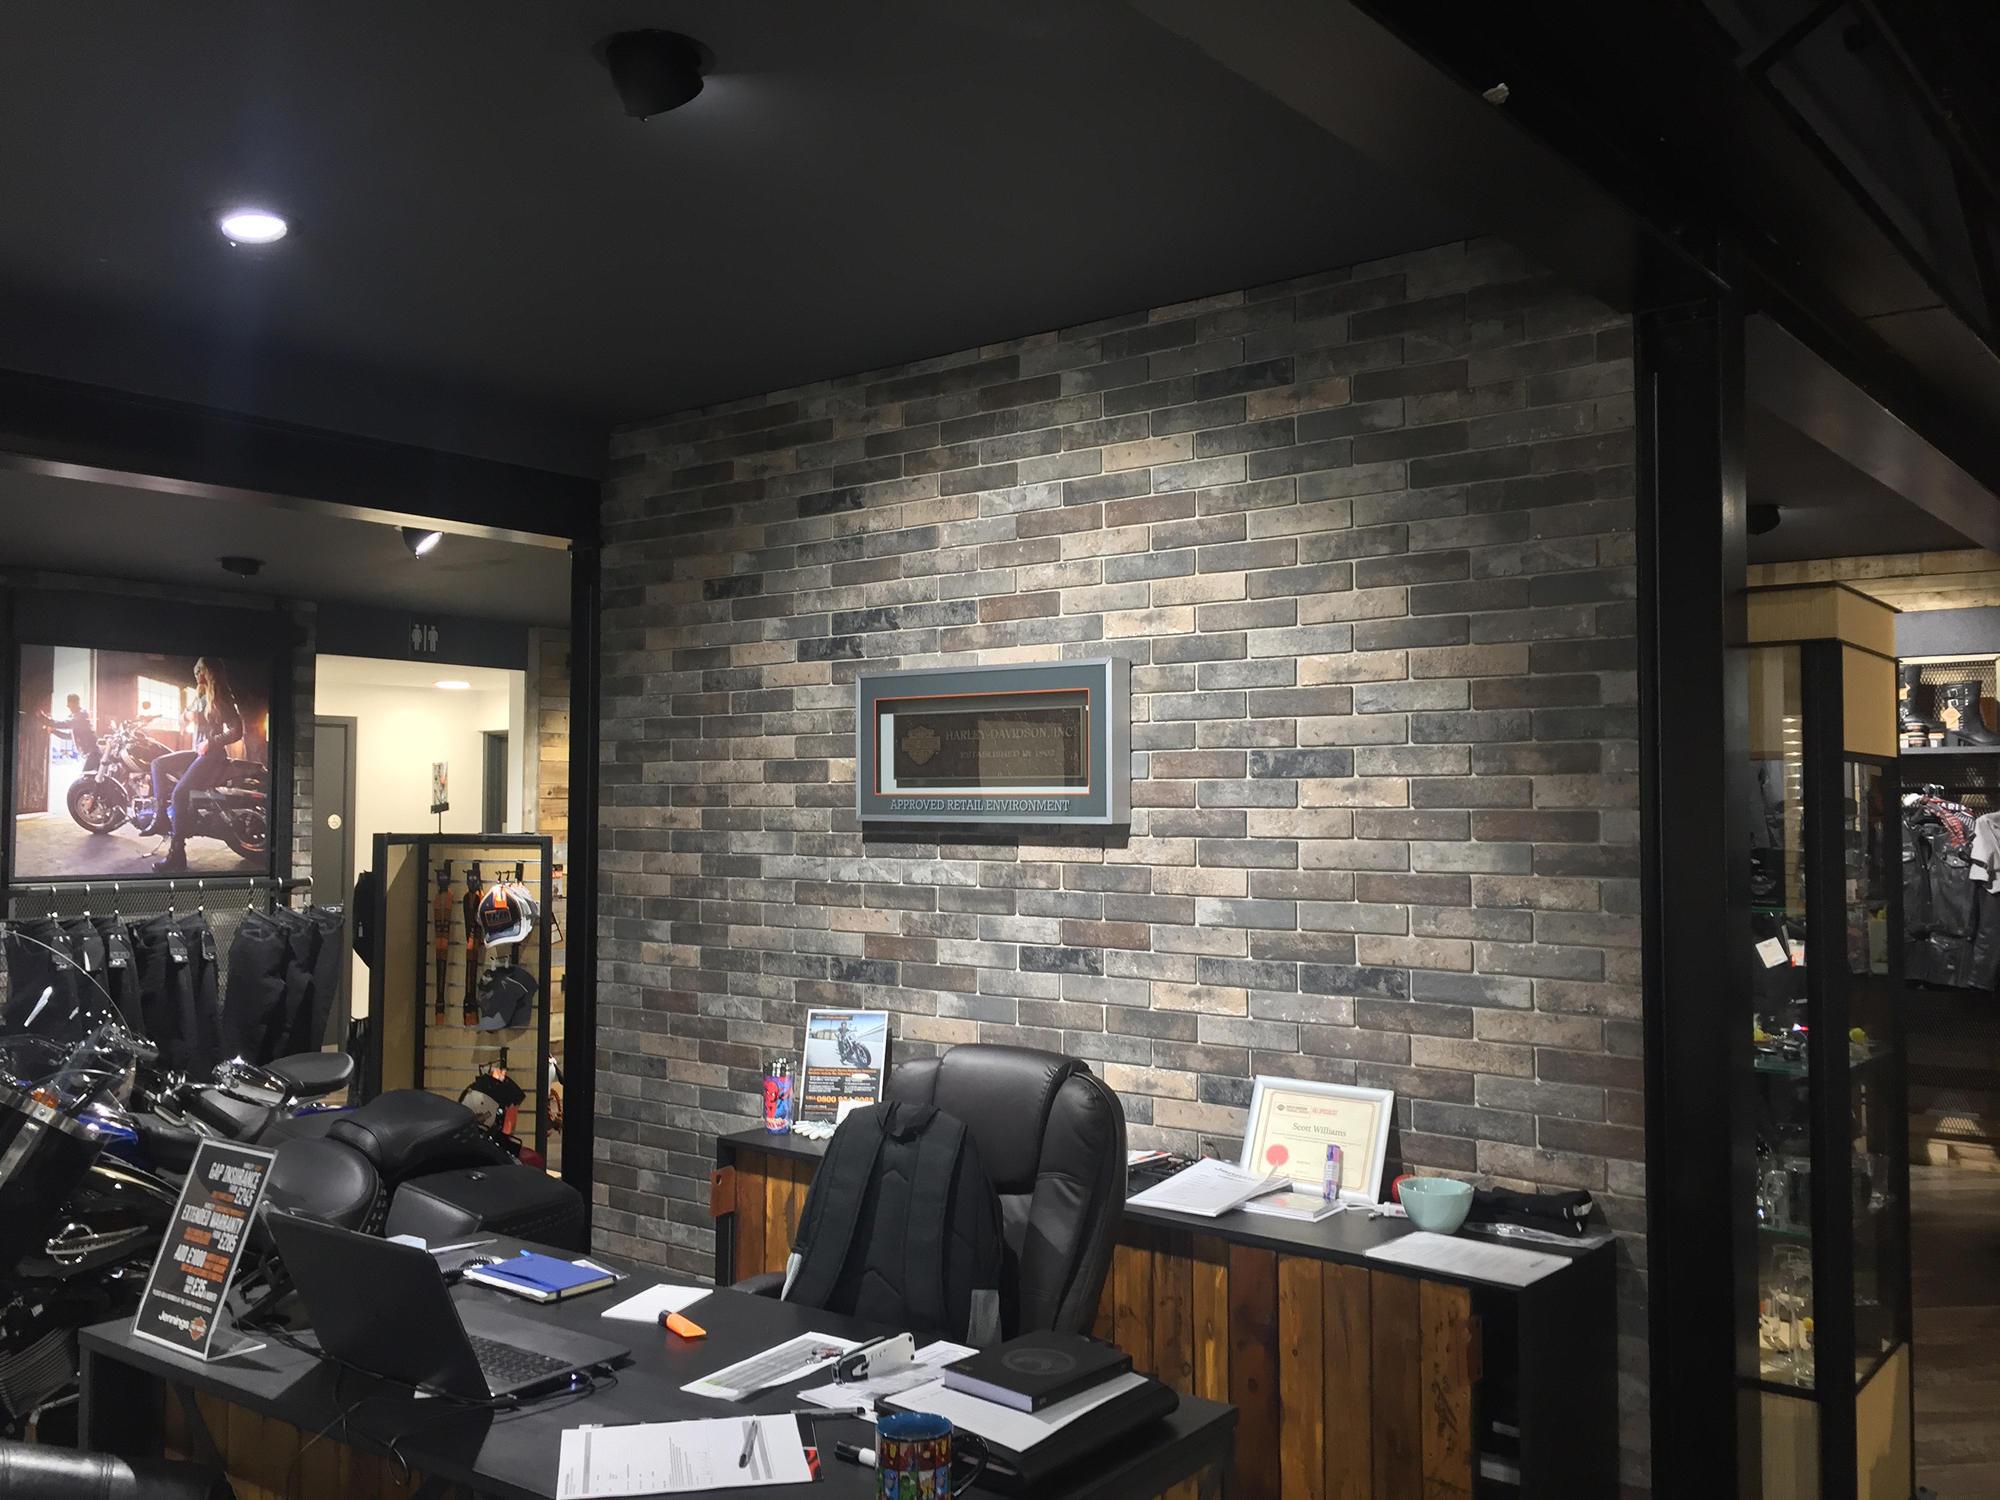 Studio Di Architettura In Inglese store harley davidson di rondine | riferimenti di produttori